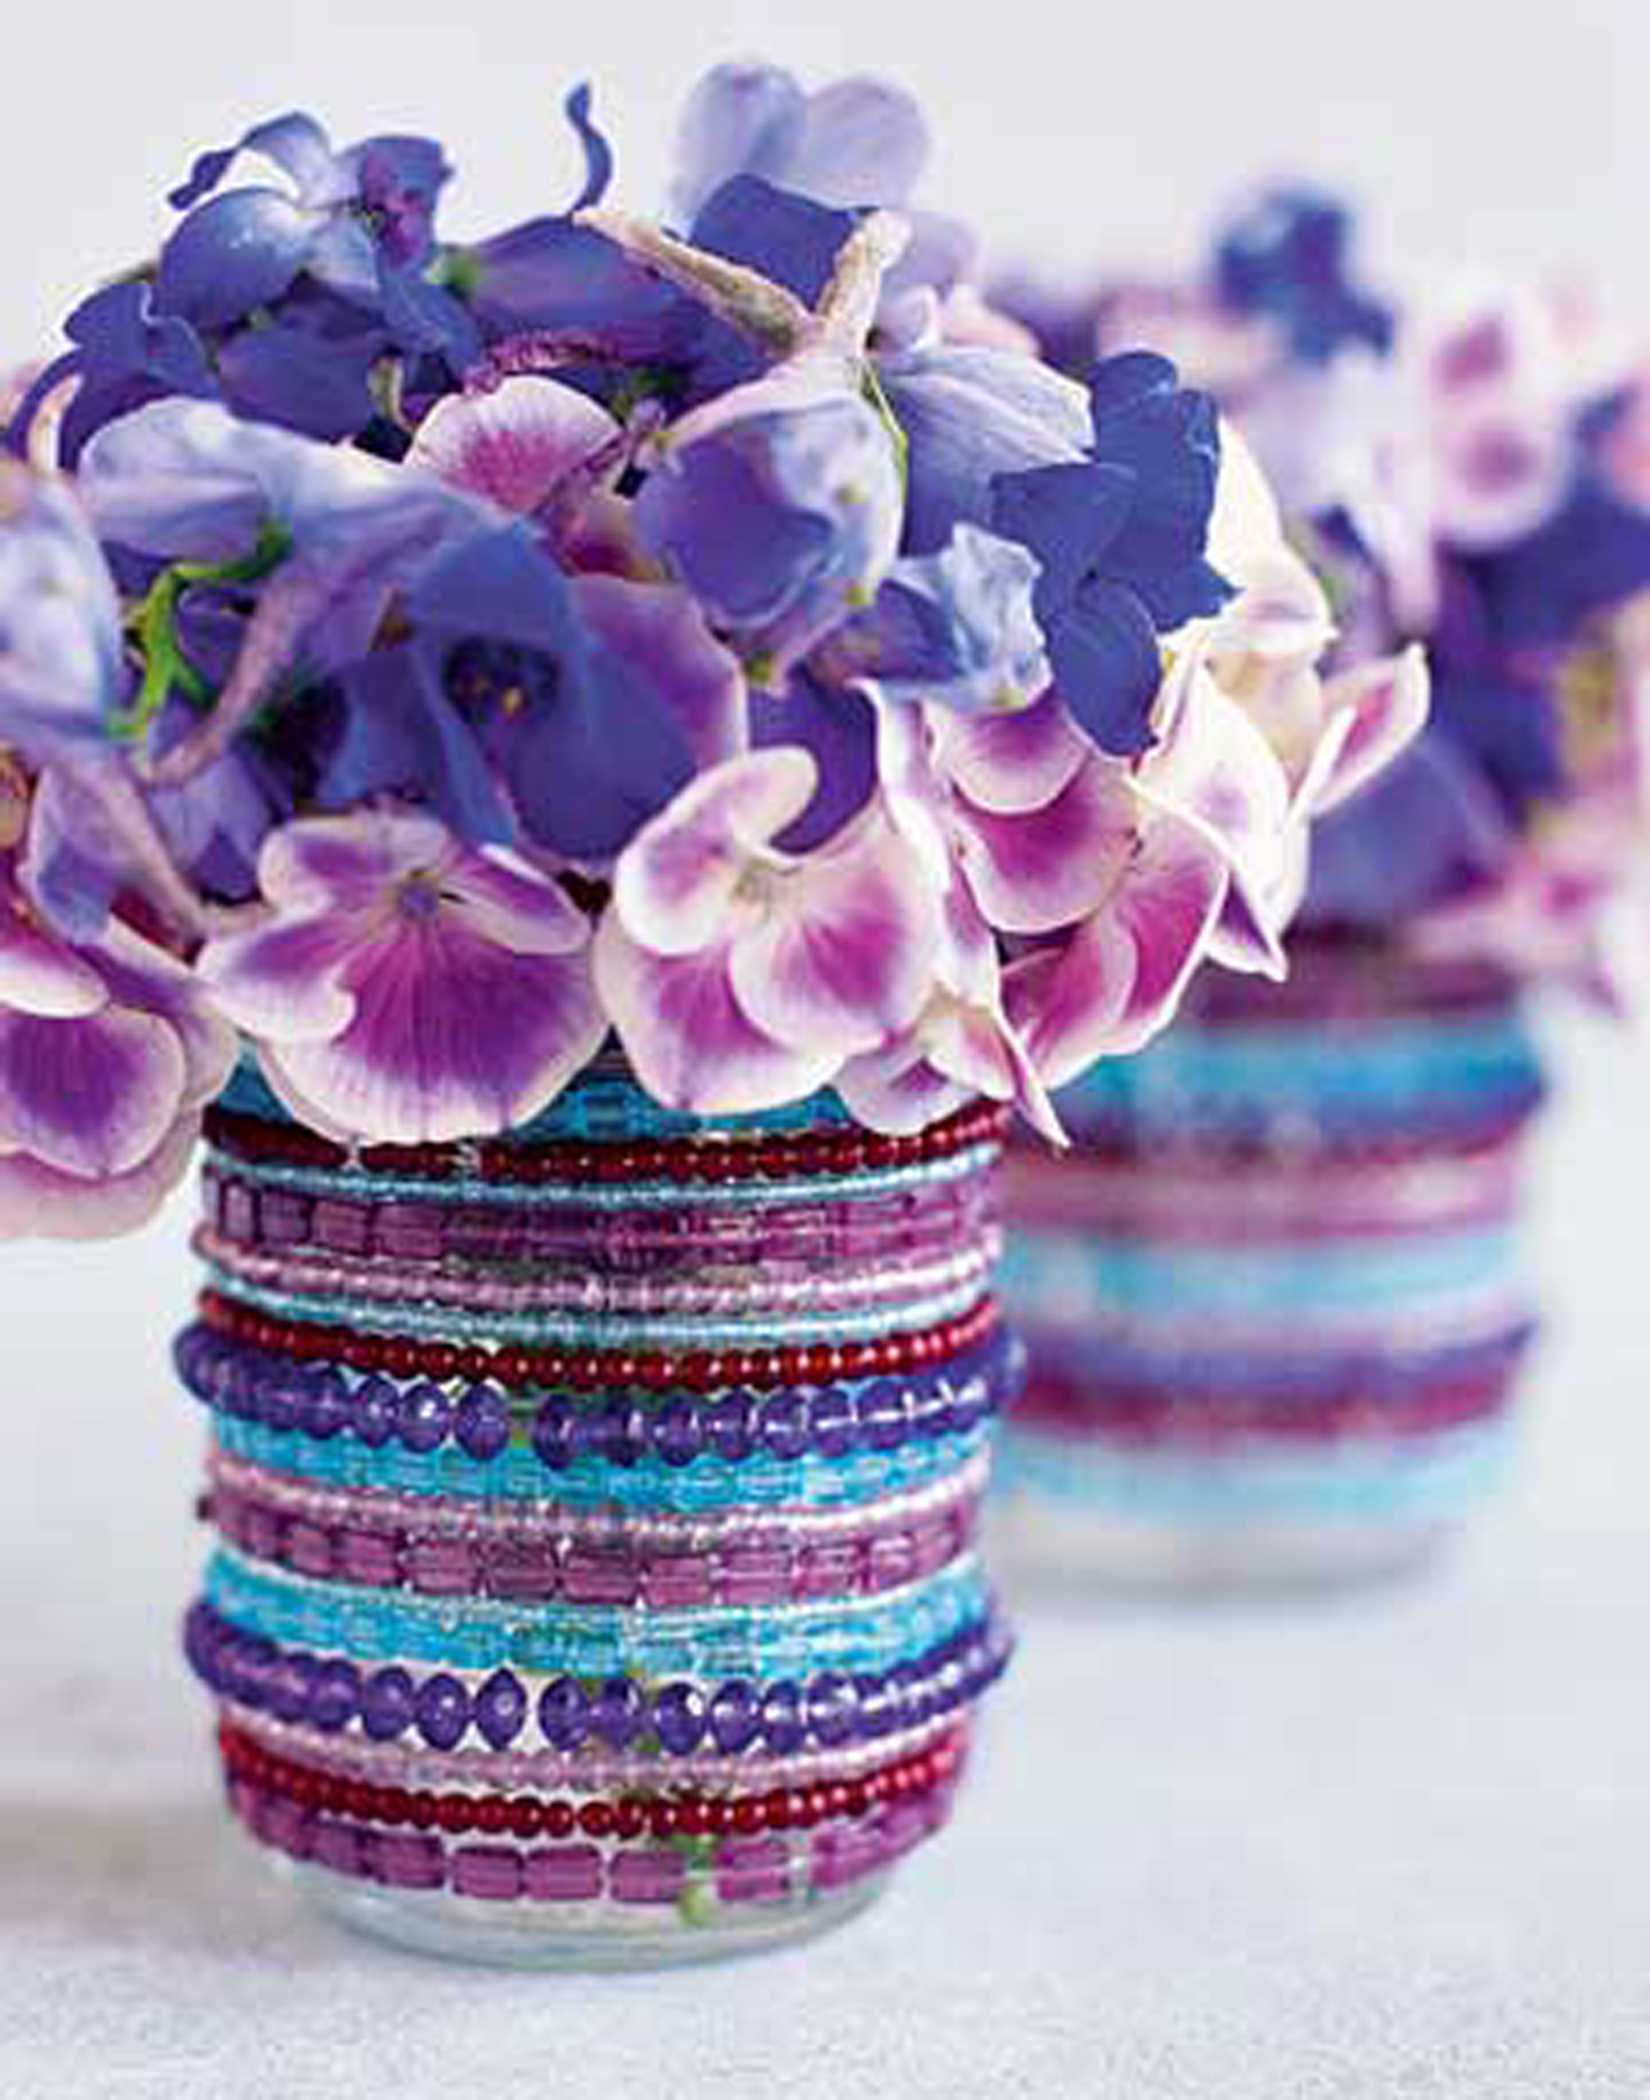 décor de perles de vase